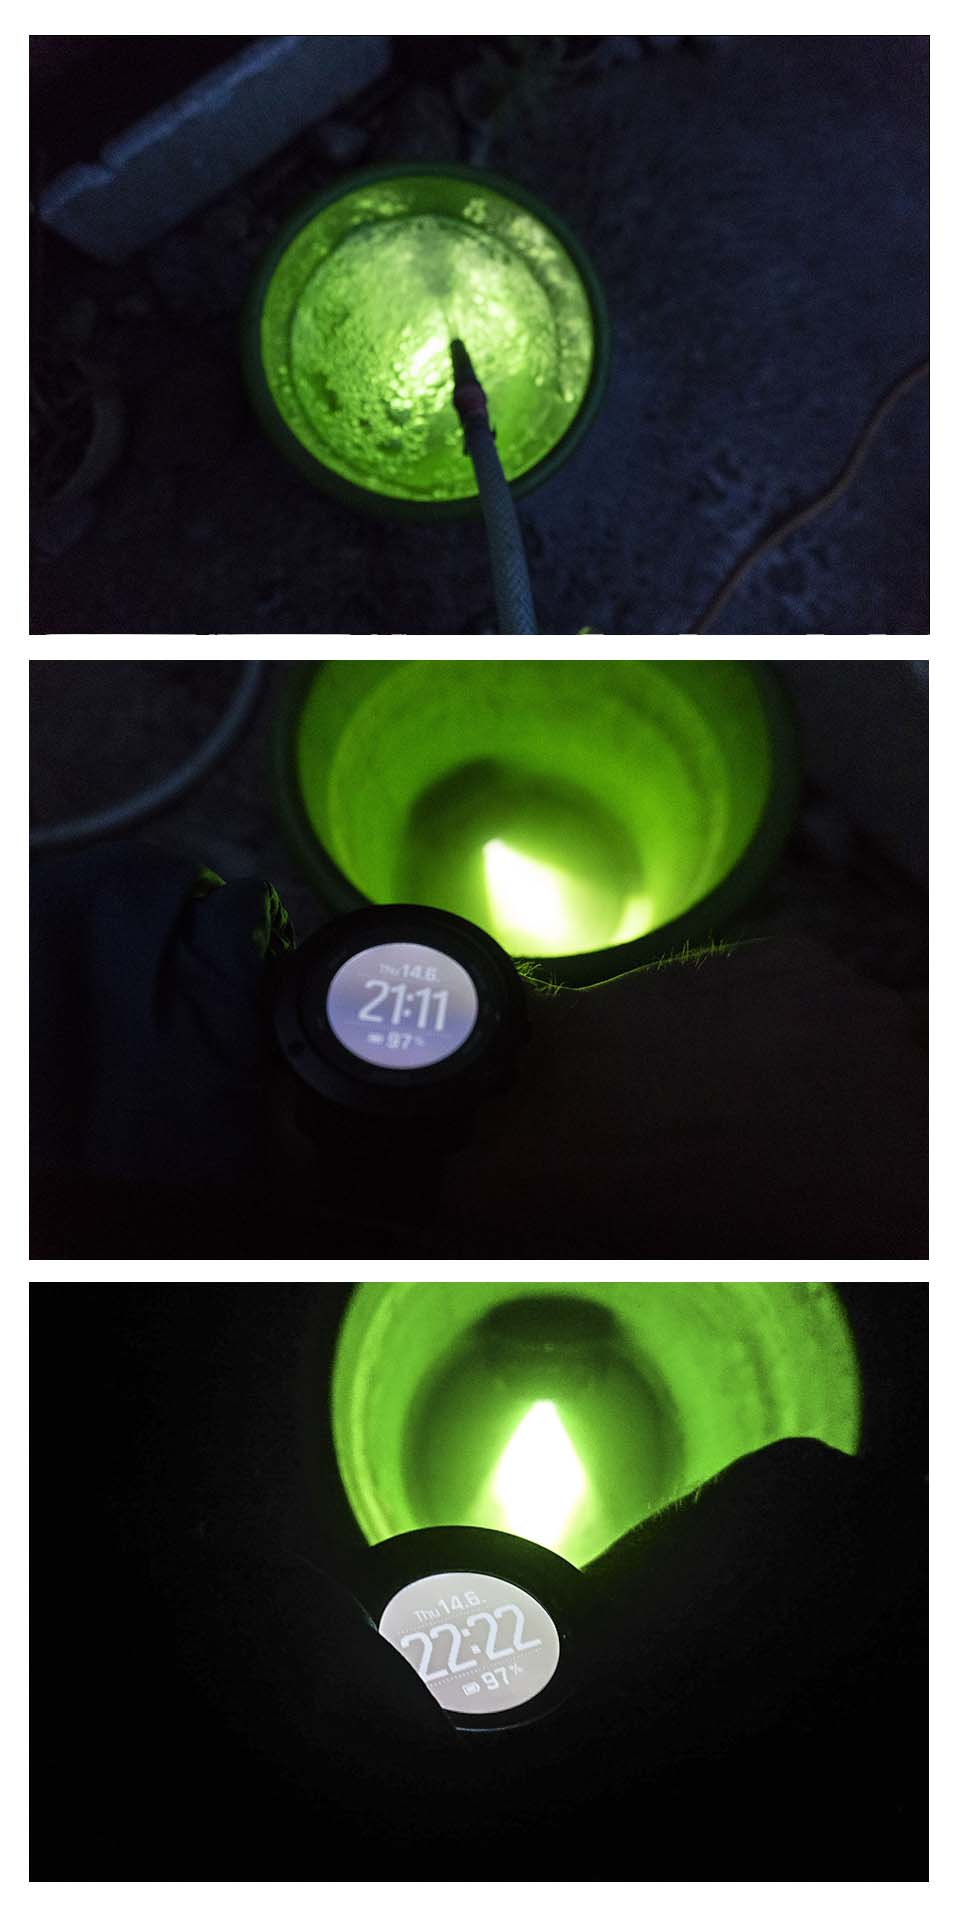 Čelovka Fenix počas testu vodotesnosti